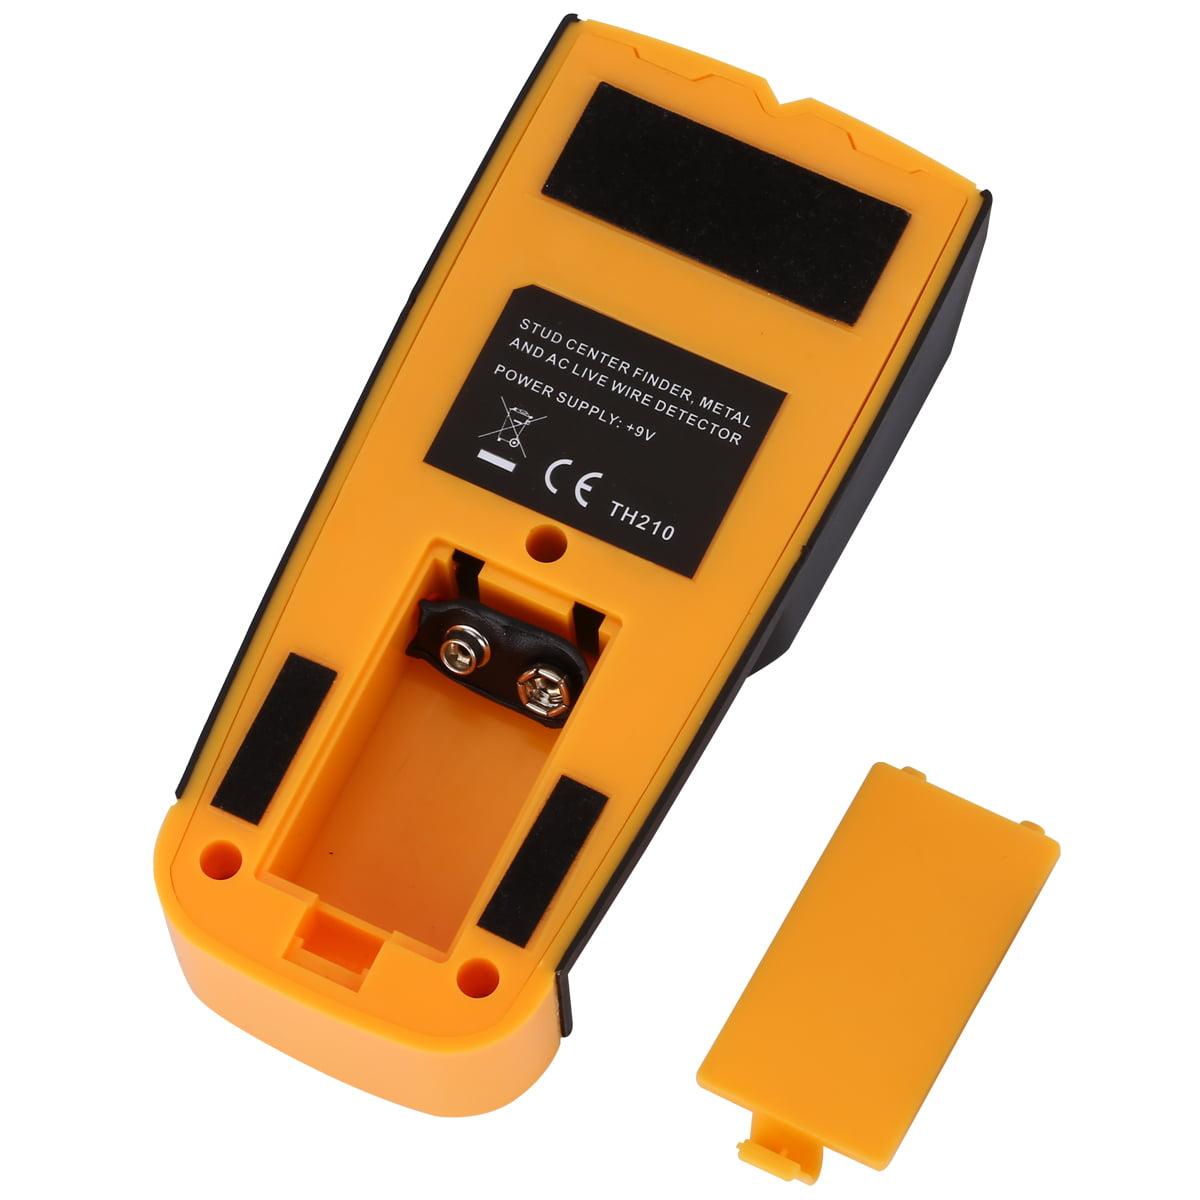 Floureon 3 In 1 Lcd Digital Stud Scanner Ac Live Wire Finder Wood Wiring Through Studs Metal Wall Detector